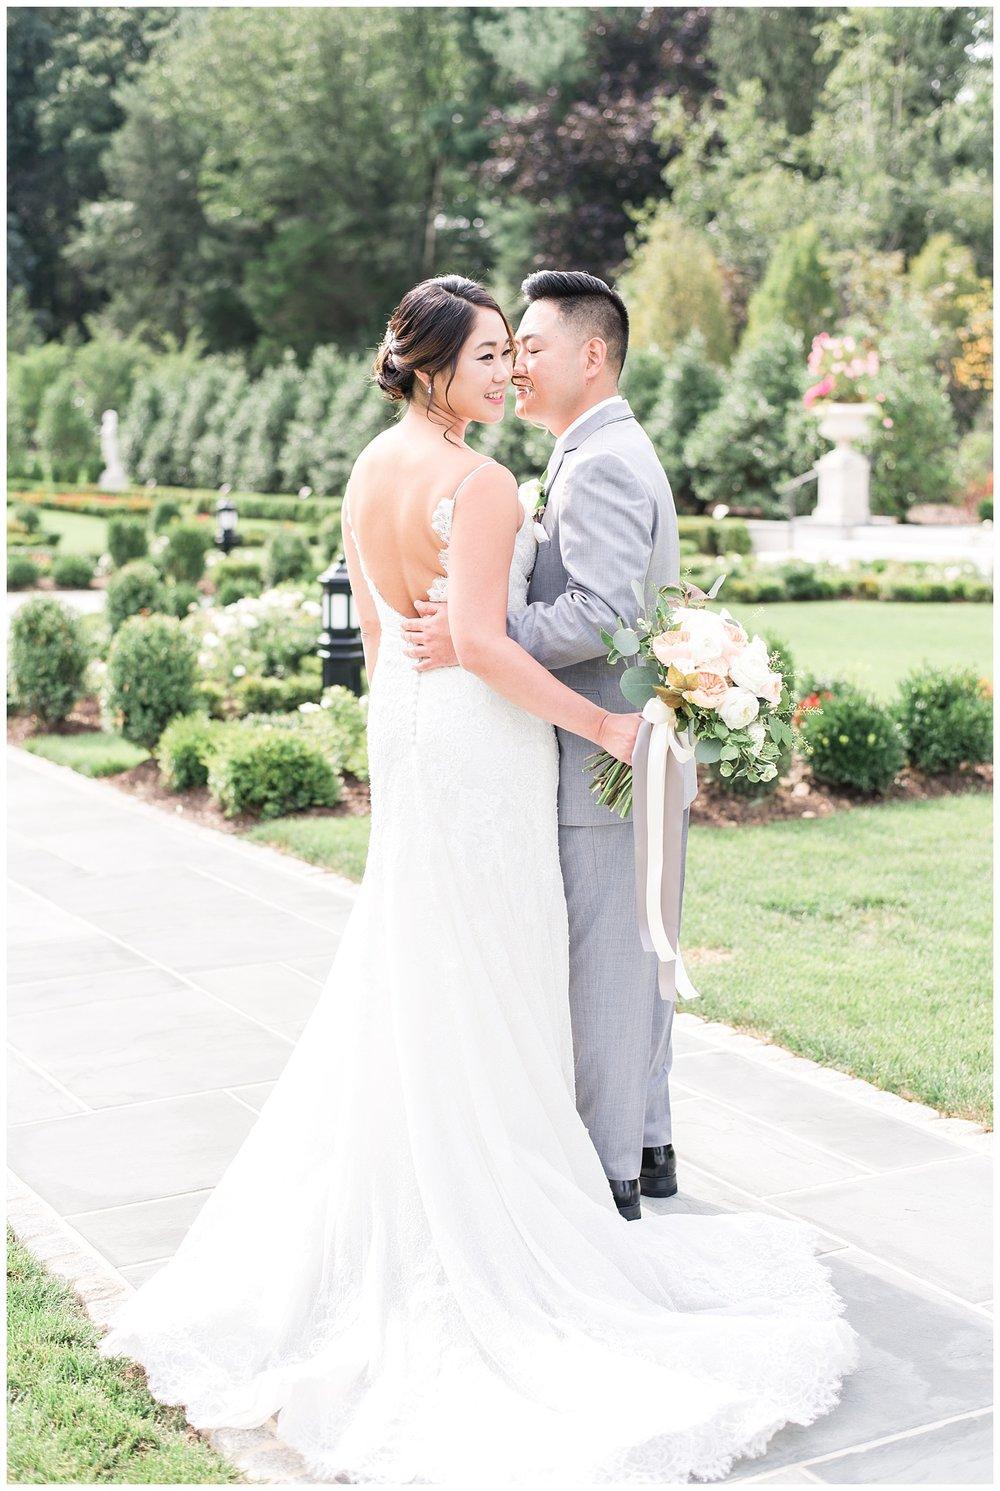 park-chateau-wedding-fabiana-skubic-photography (21).jpg